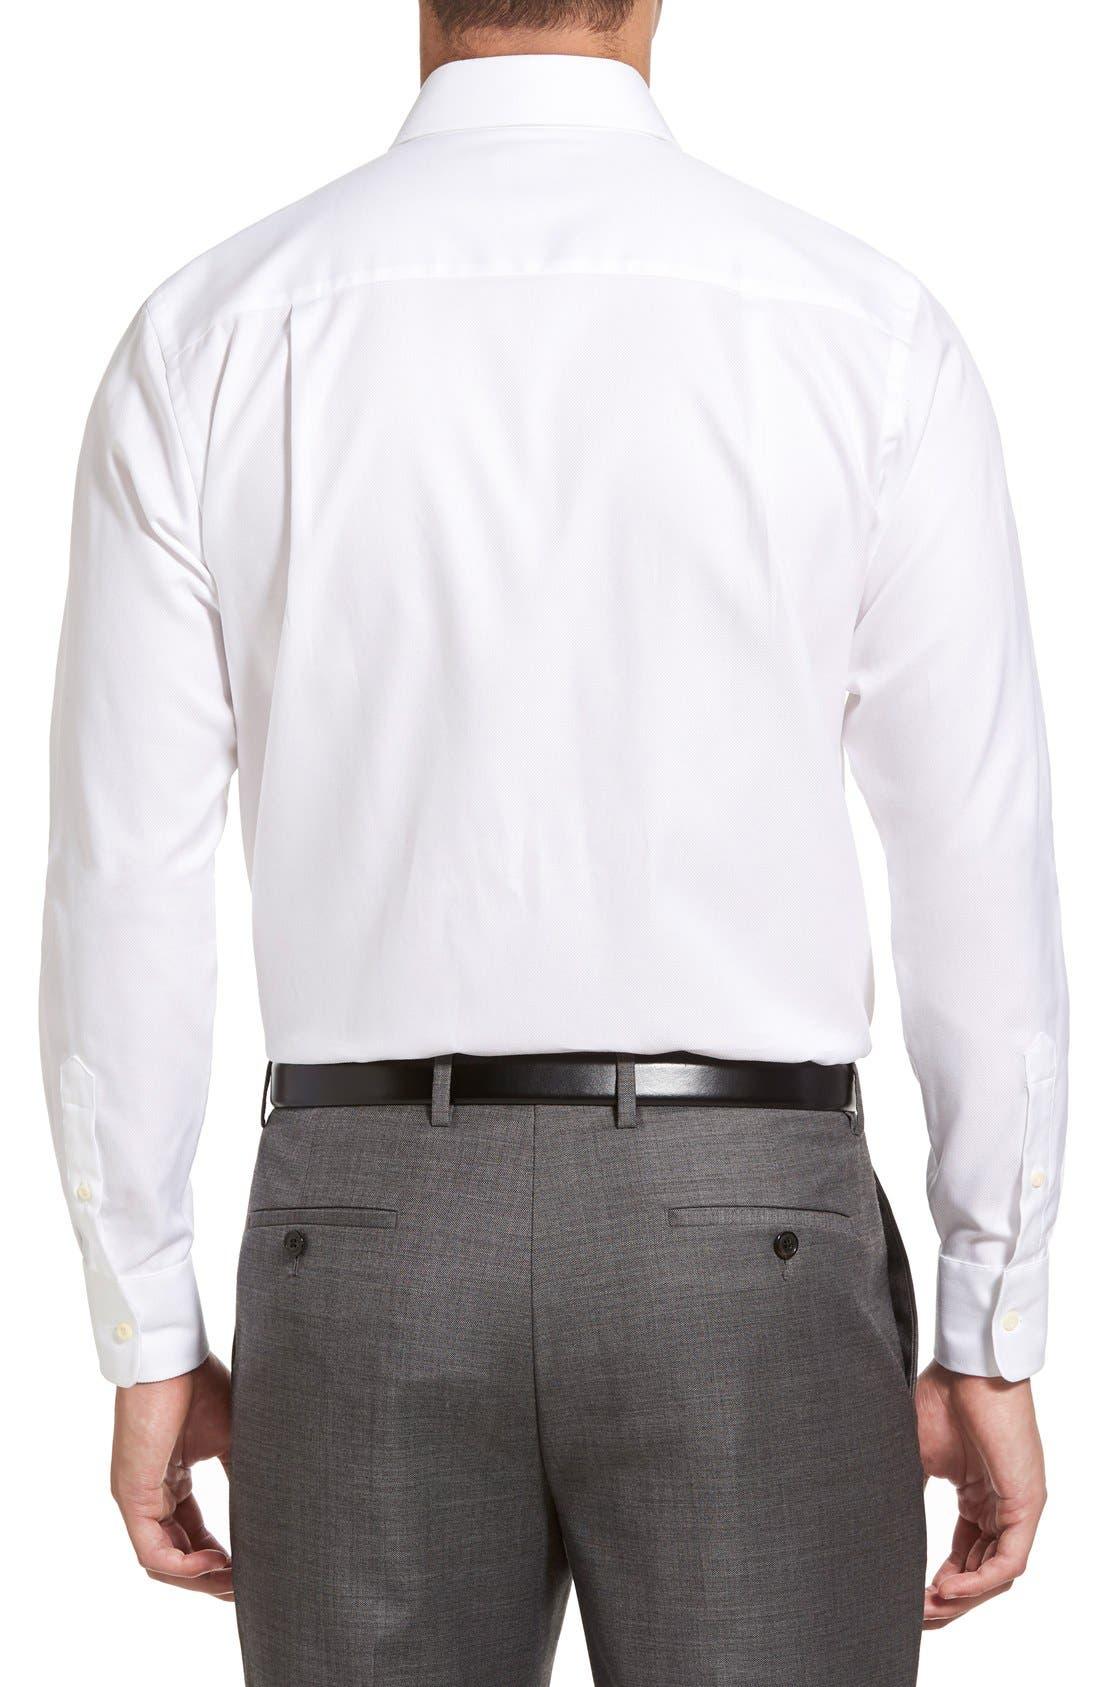 DAVID DONAHUE, Trim Fit Dress Shirt, Alternate thumbnail 6, color, WHITE